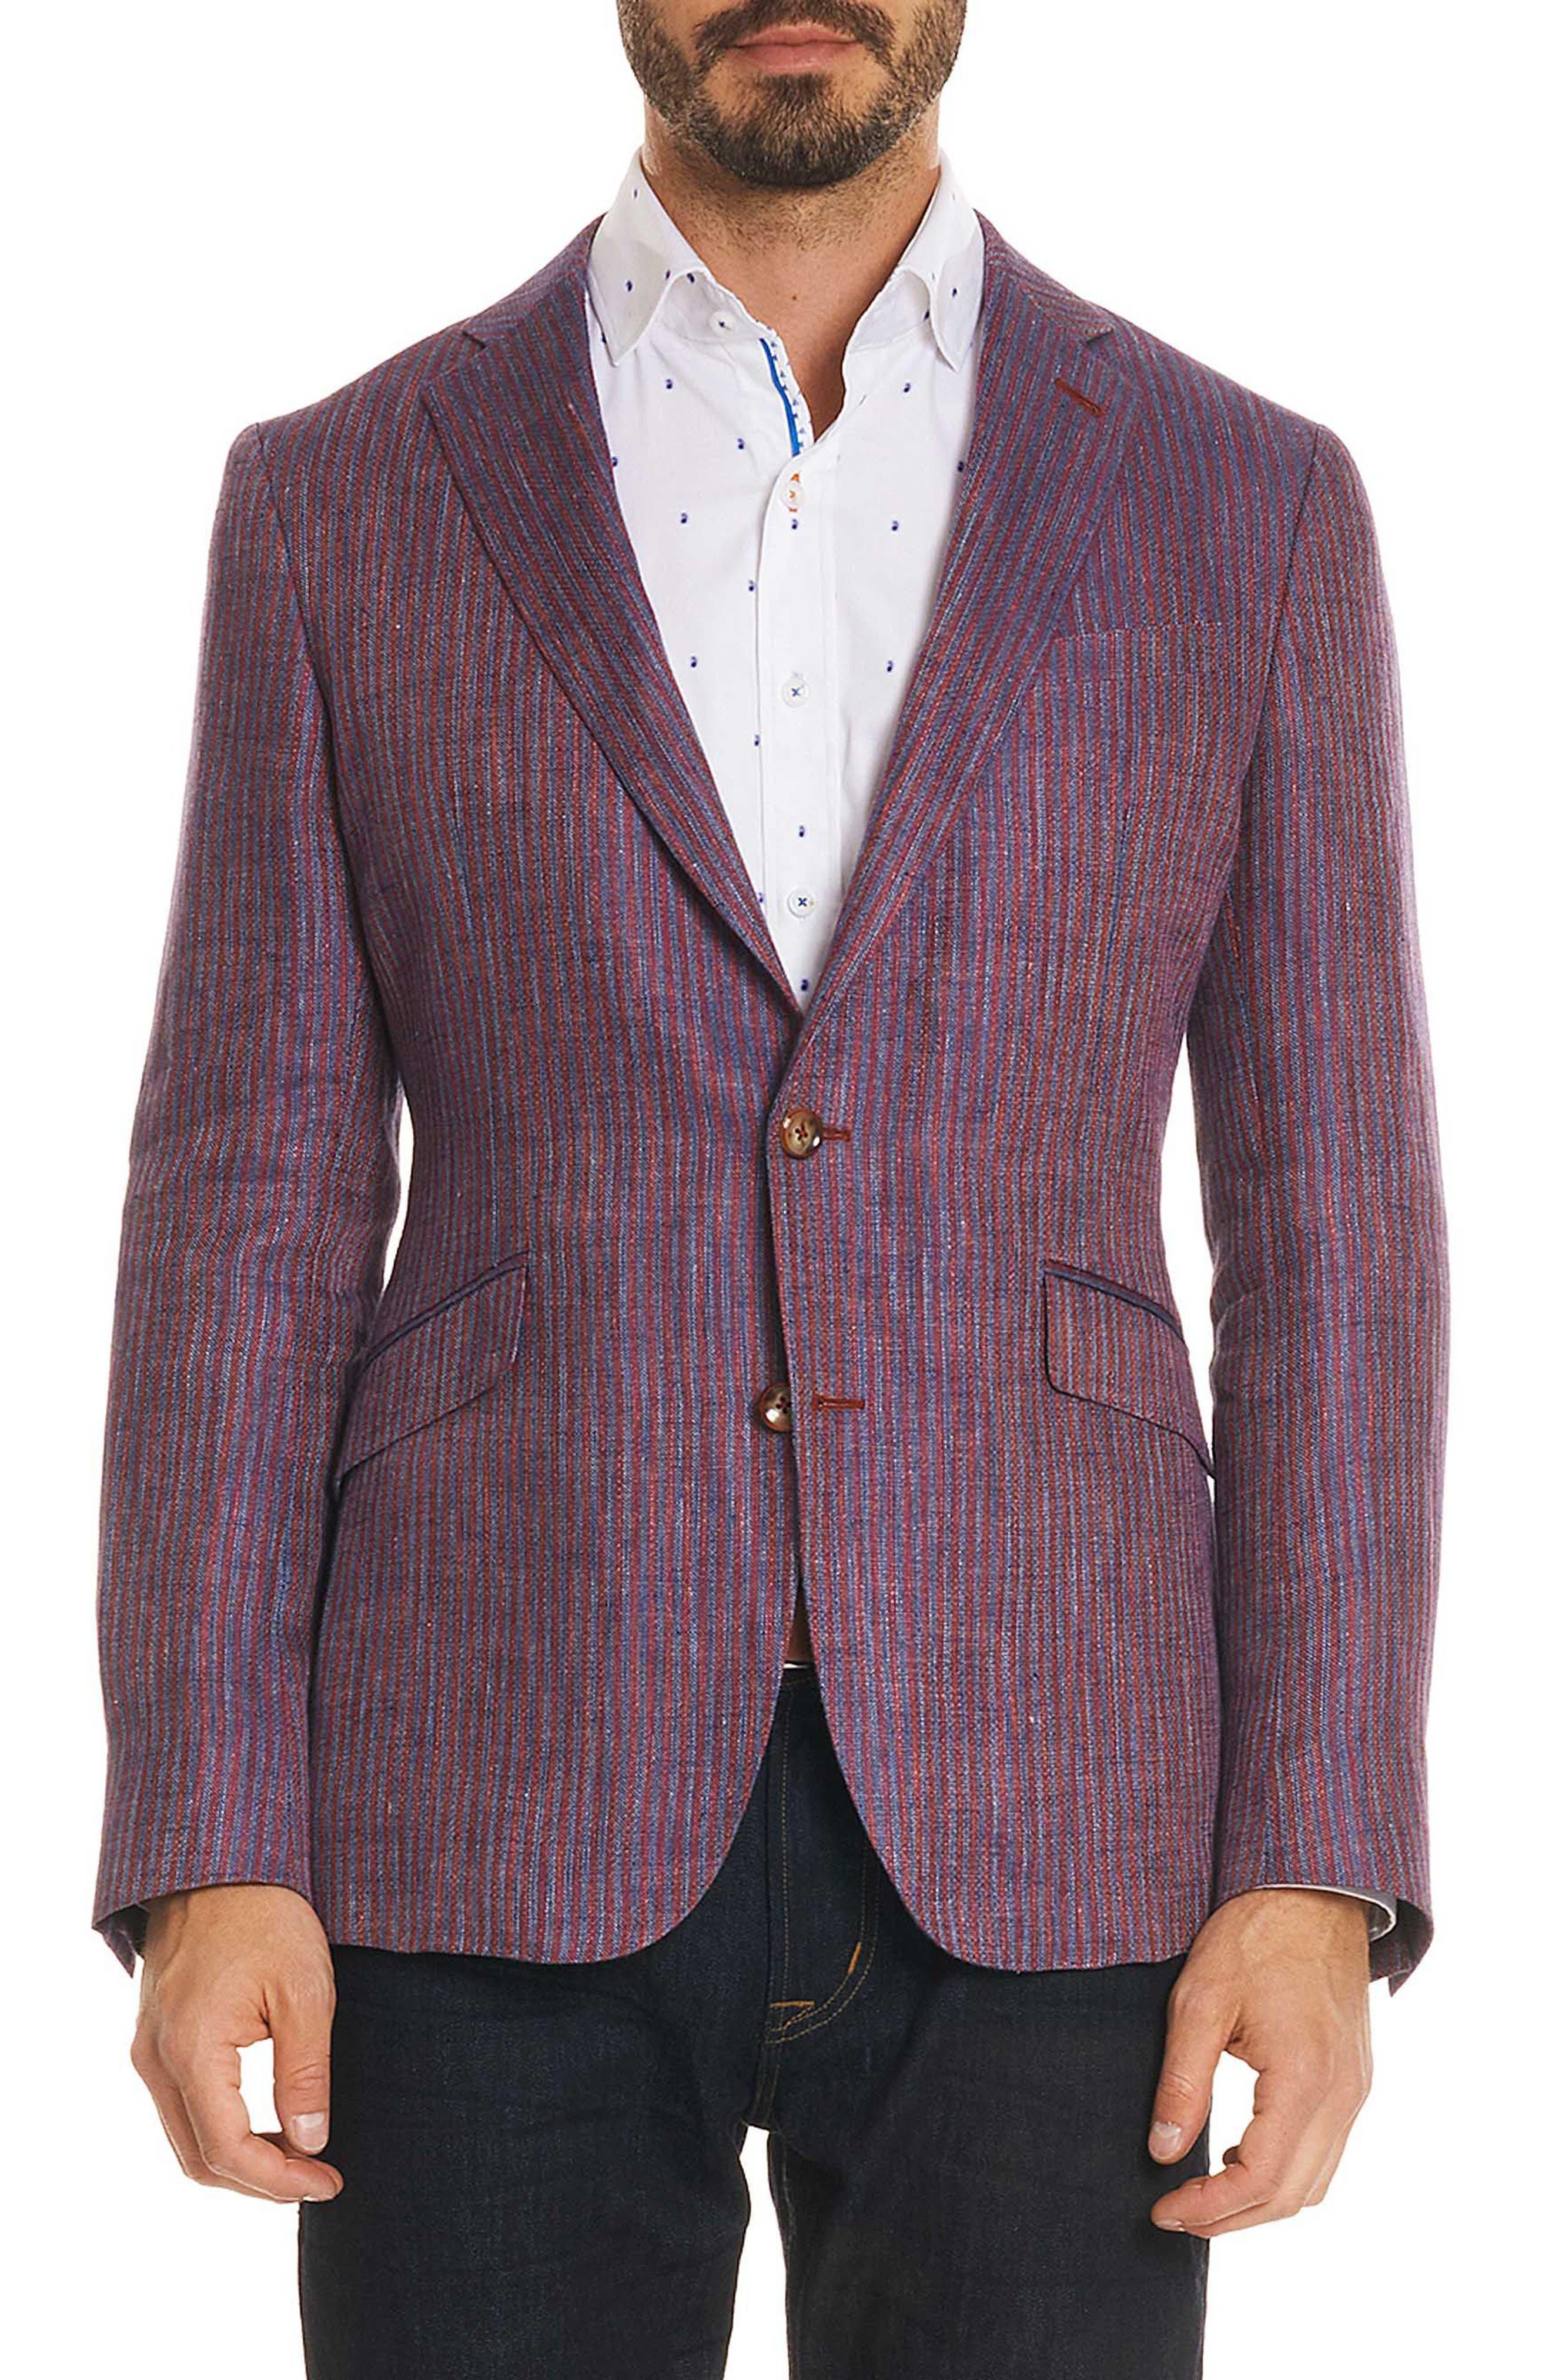 Corbett Tailored Fit Stripe Linen Sport Coat,                         Main,                         color, Berry